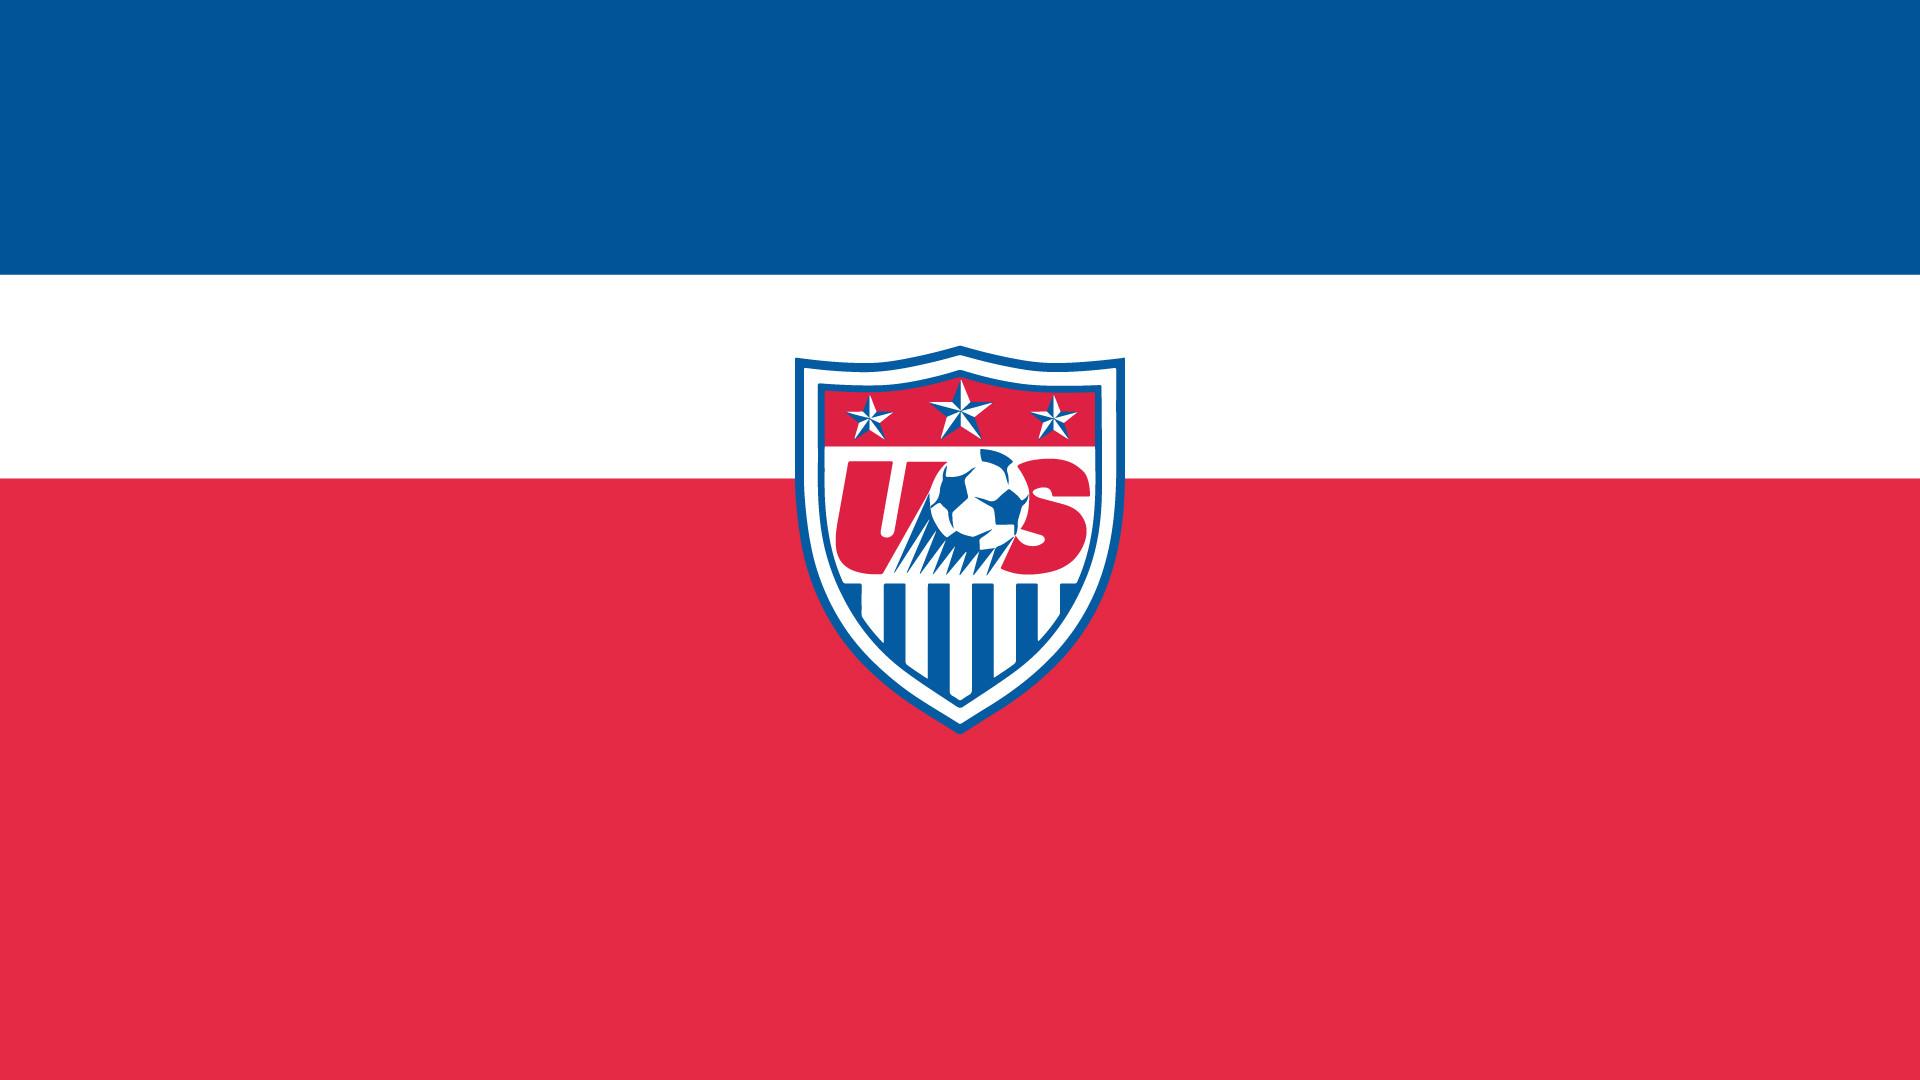 Usa Soccer Logo 2014